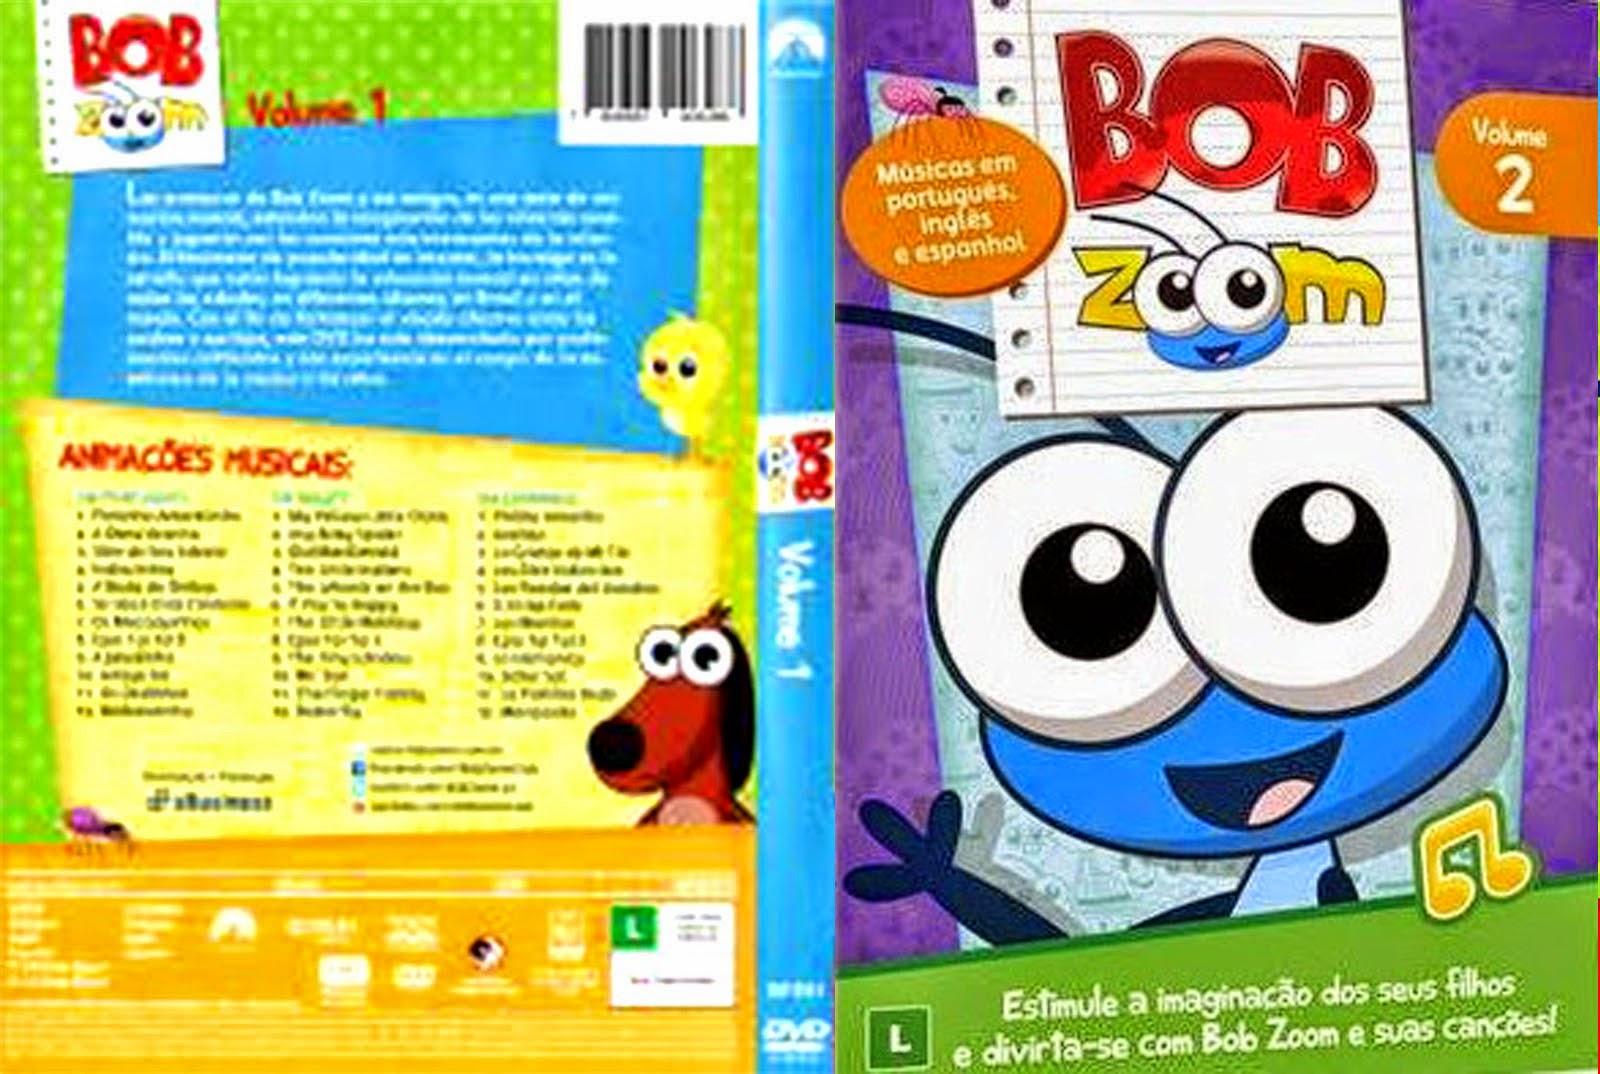 Download Bob Zoom Vol. 2 DVDRip XviD Dublado Bob Zoom  E2 80 93 Vol02